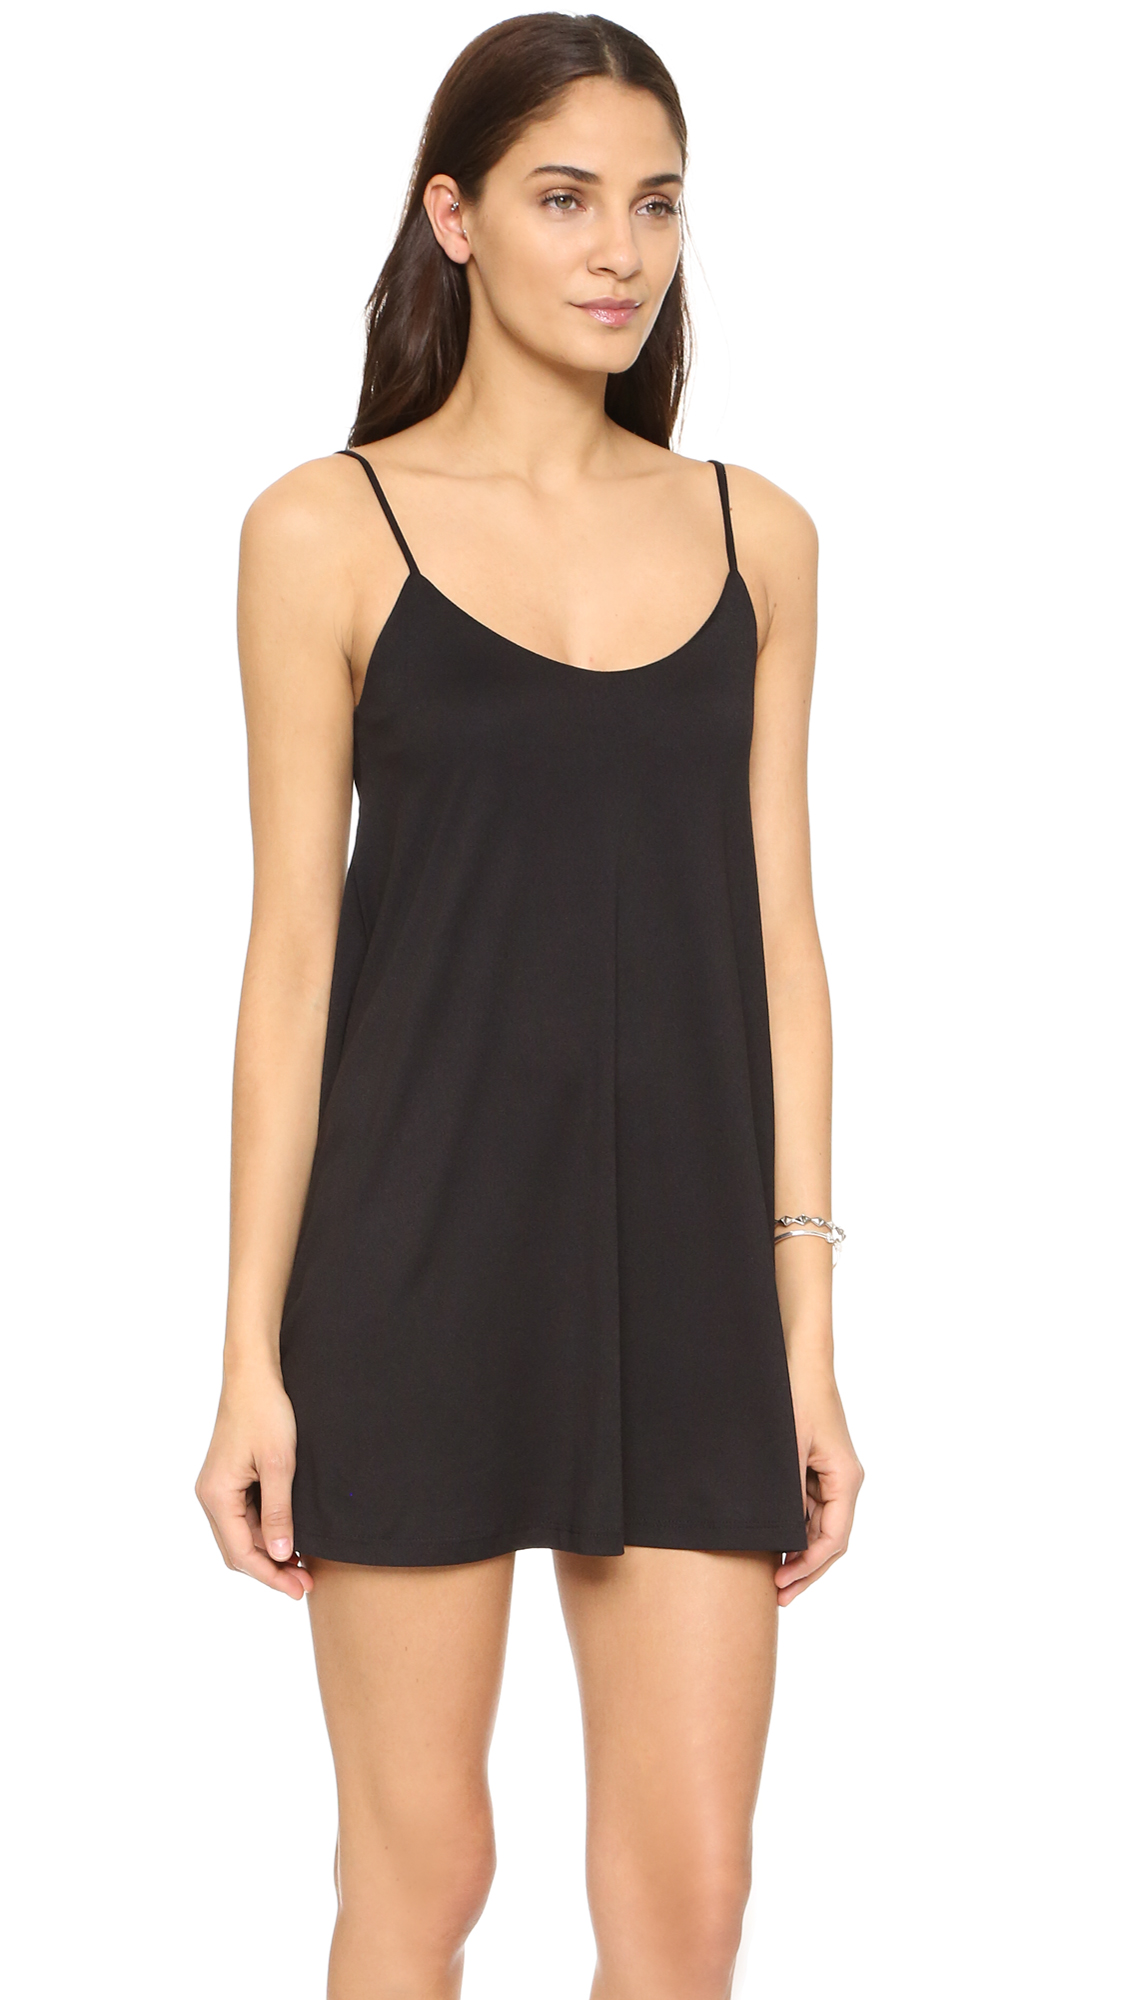 c5223f69af9 Susana Monaco Very V Drape Dress